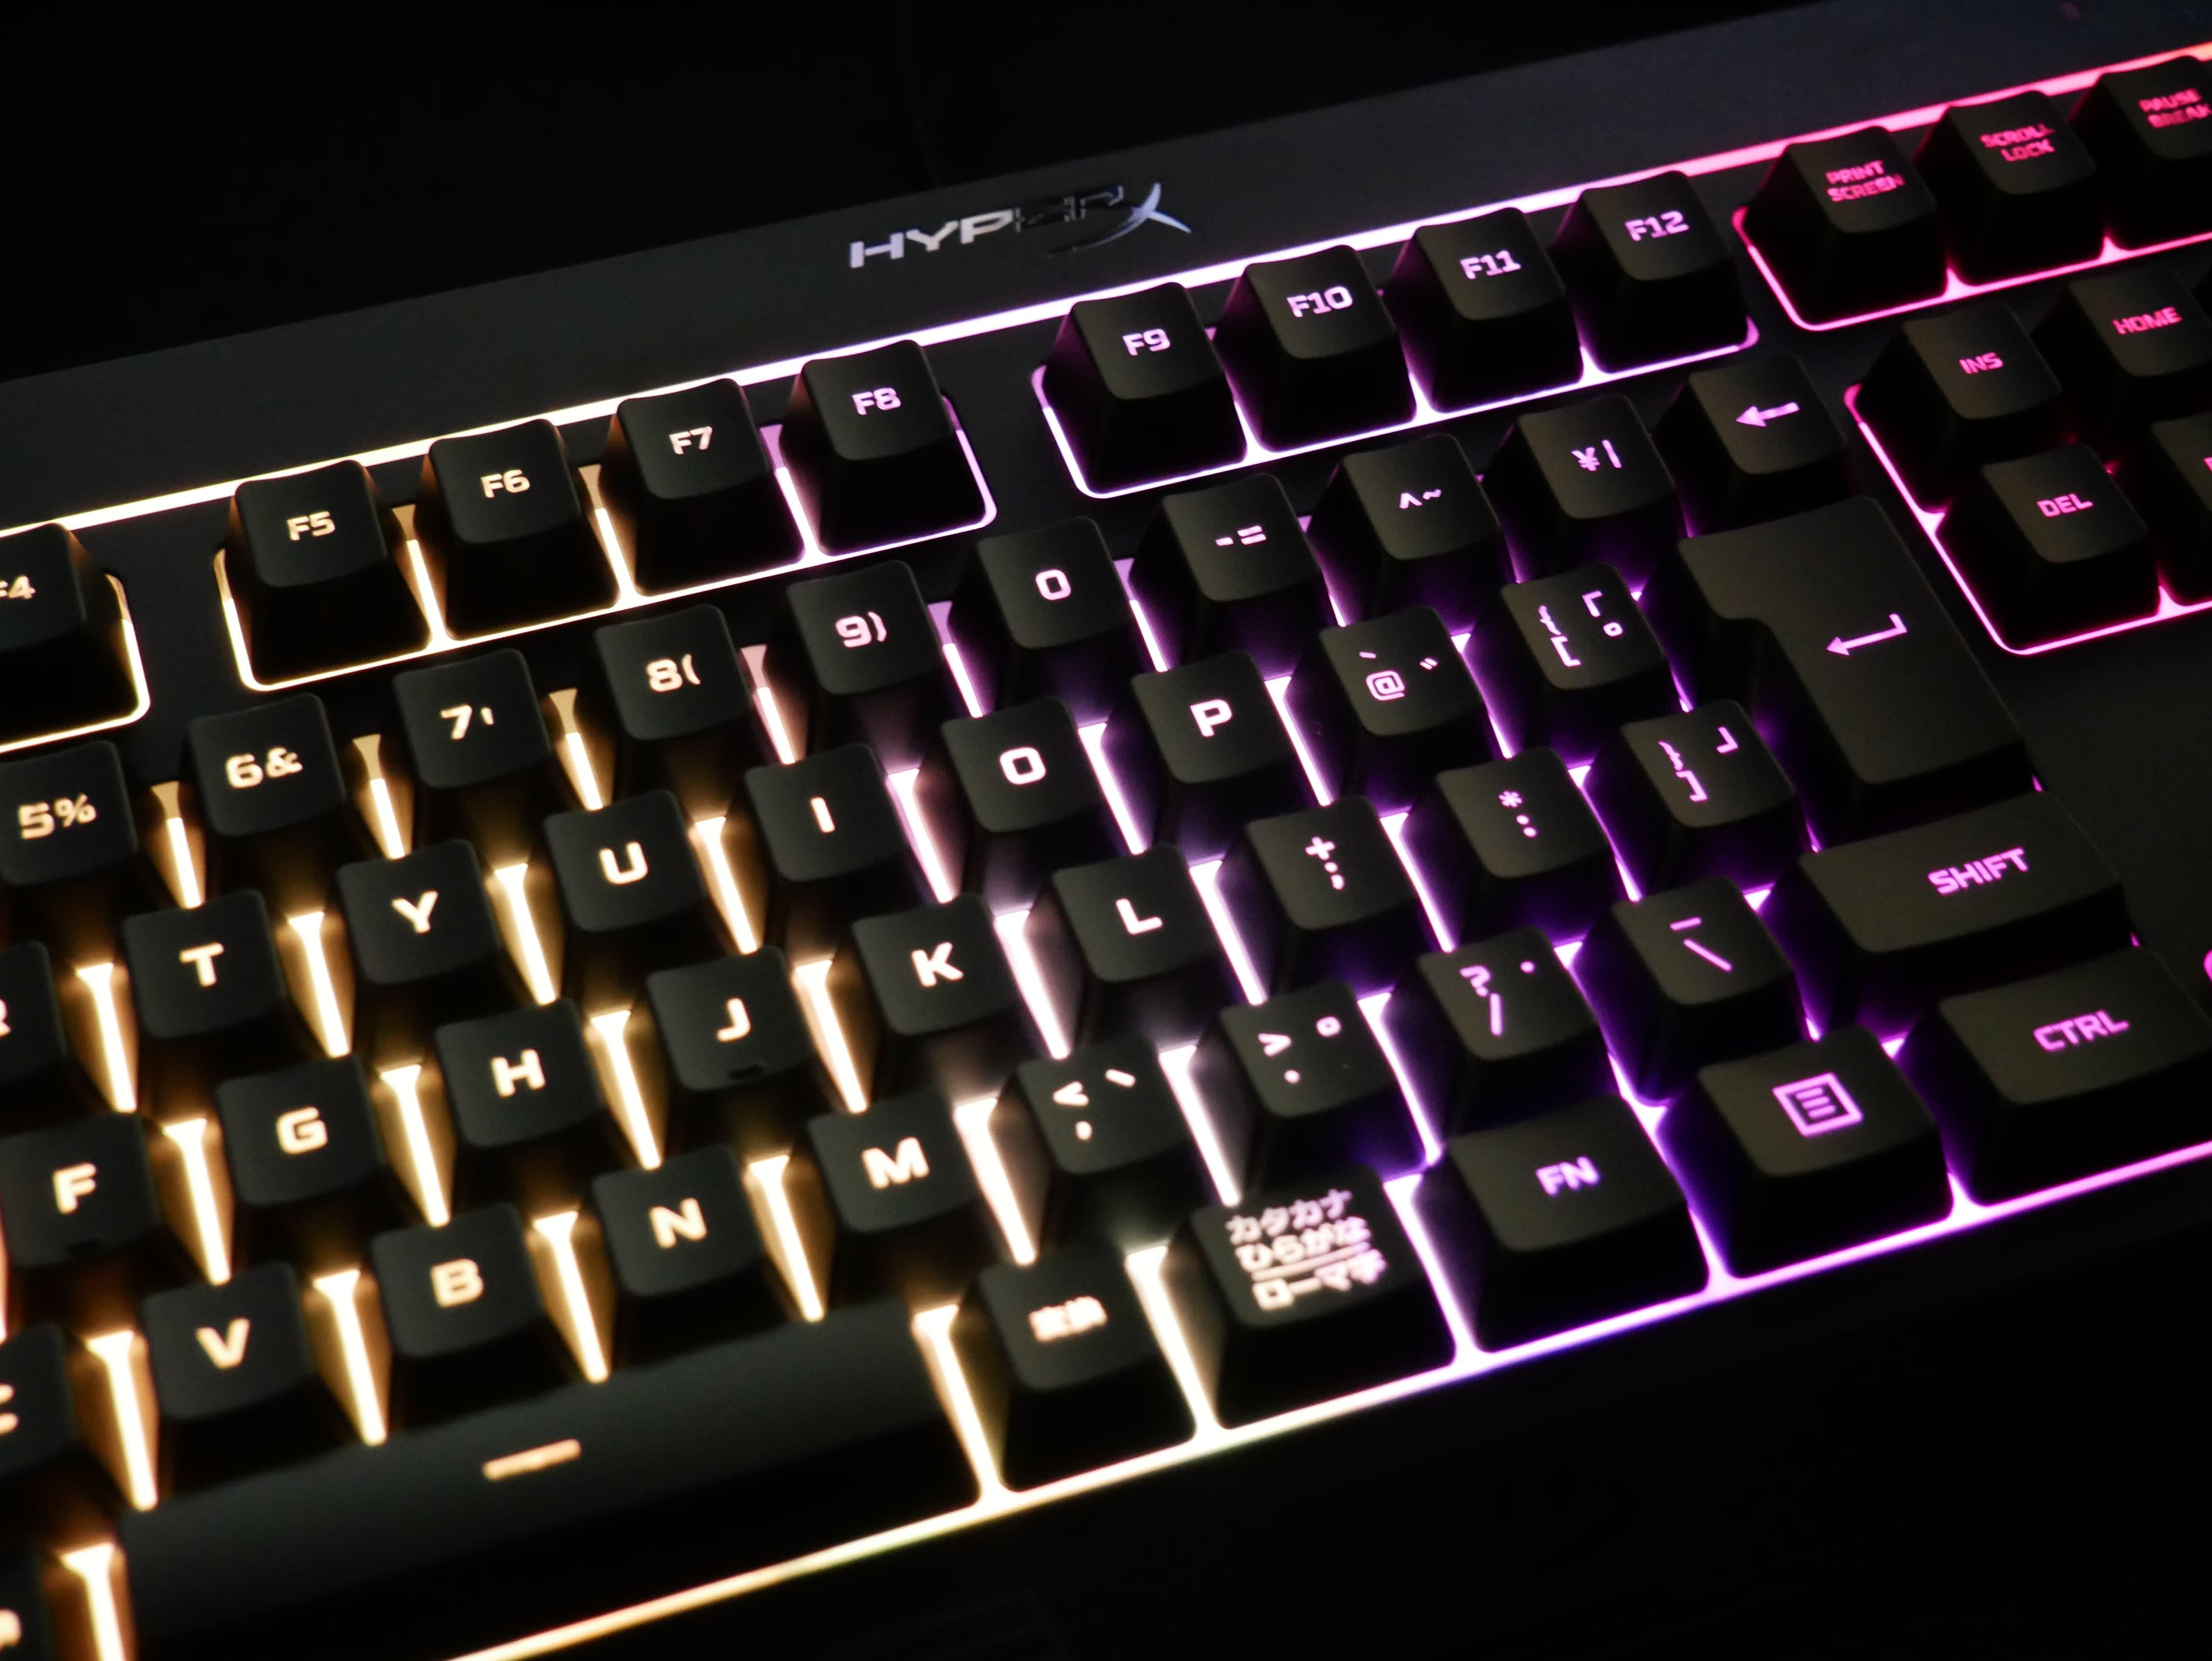 「HyperX Alloy Core RGB」レビュー。メンブレンスイッチ採用で低価格かつ充実した機能を備えるゲーミングキーボード